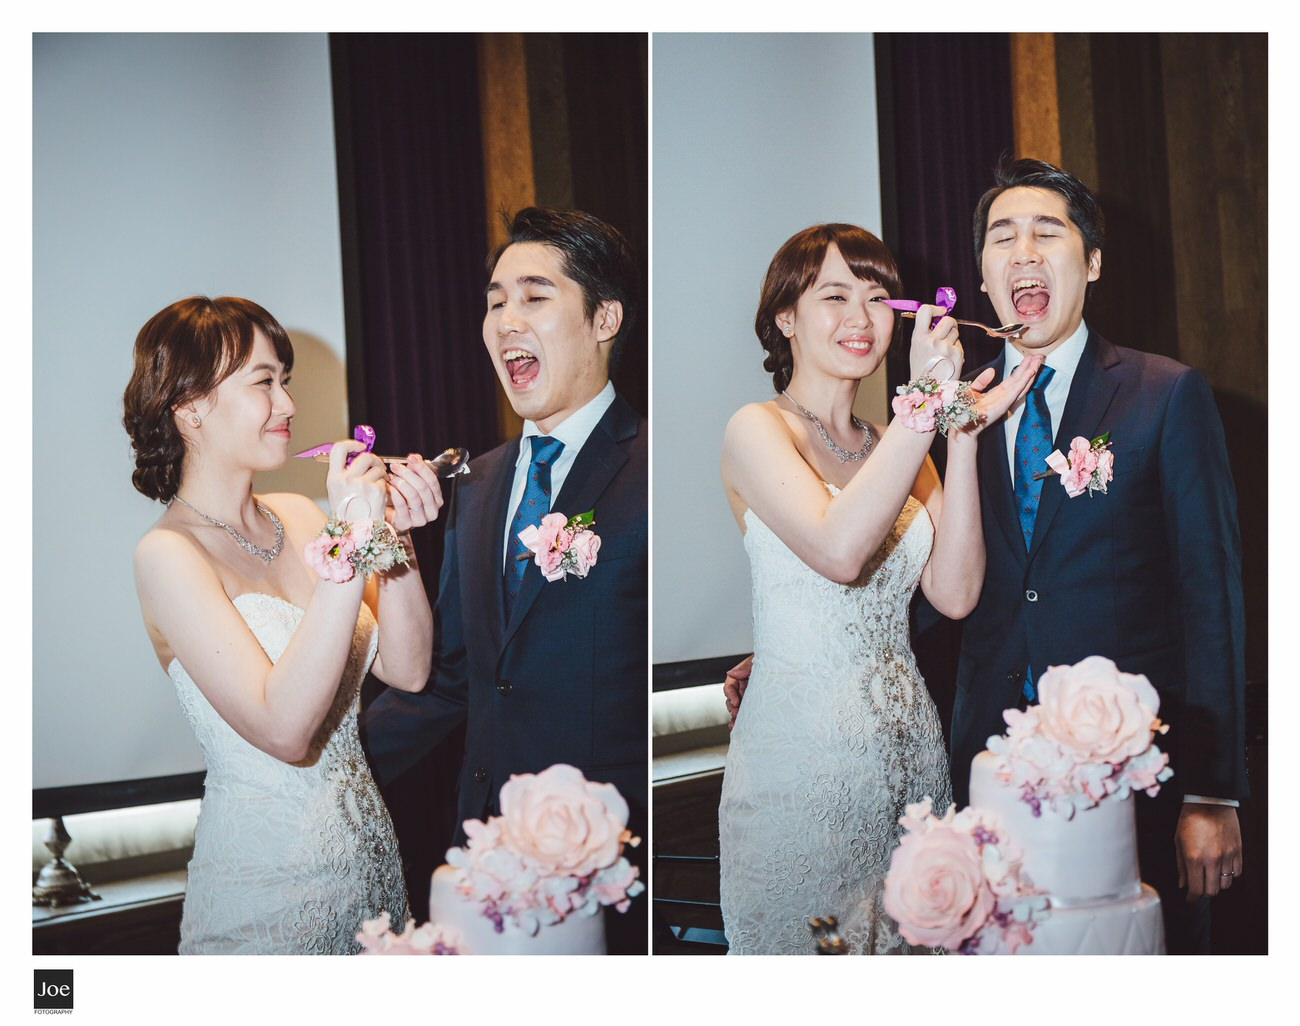 joe-fotography-wedding-photo-palais-de-chine-hotel-024.jpg